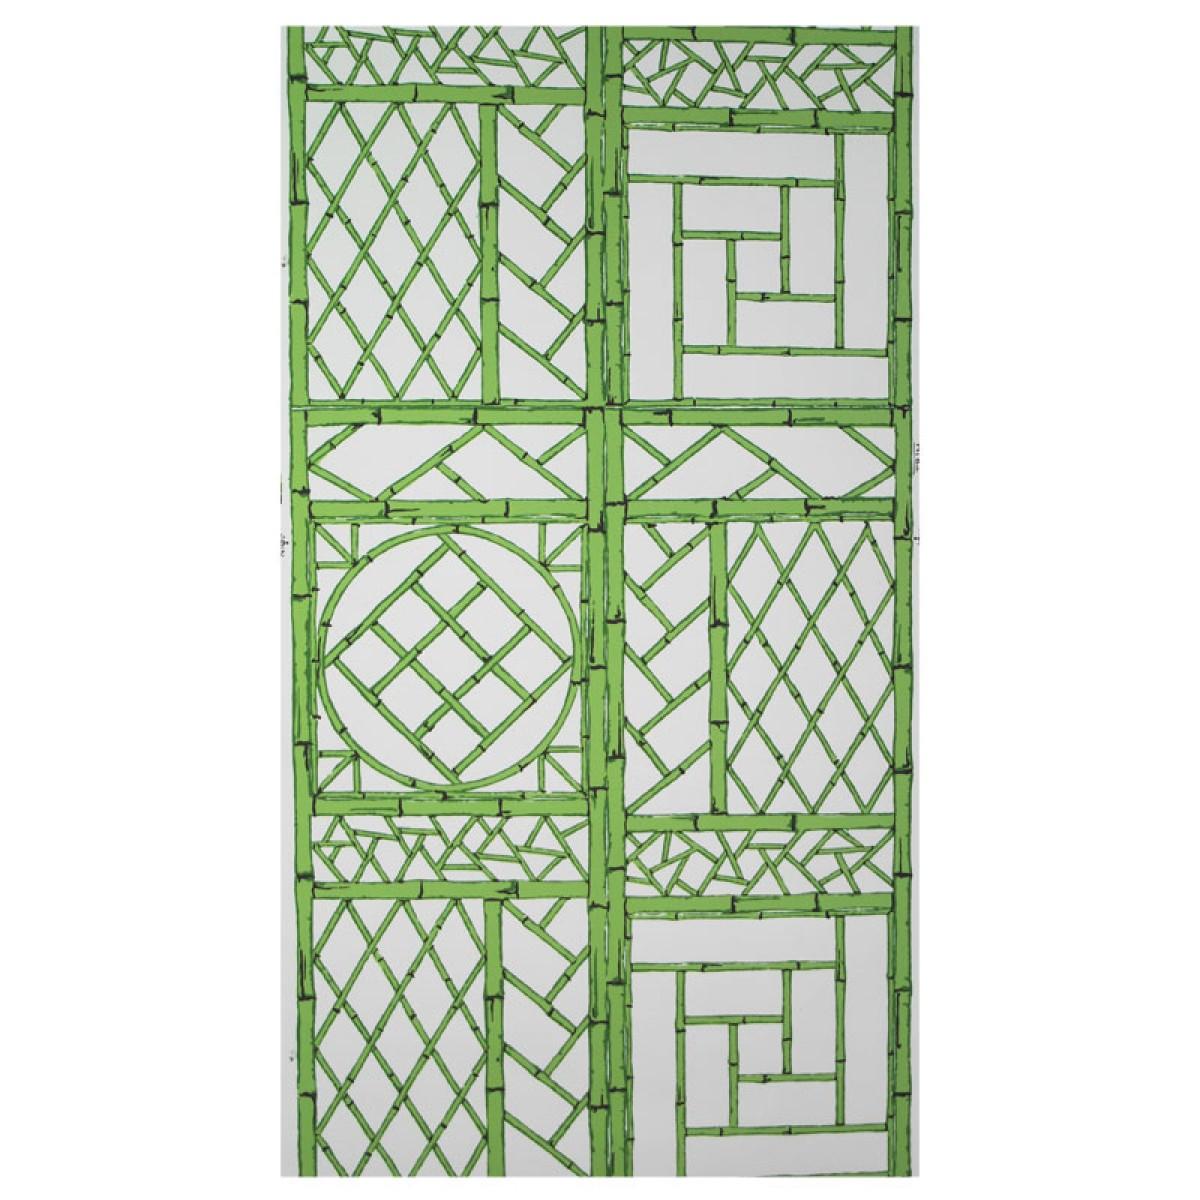 Green Chinese Lattice Wallpaper Set of 2 Rolls 1200x1200